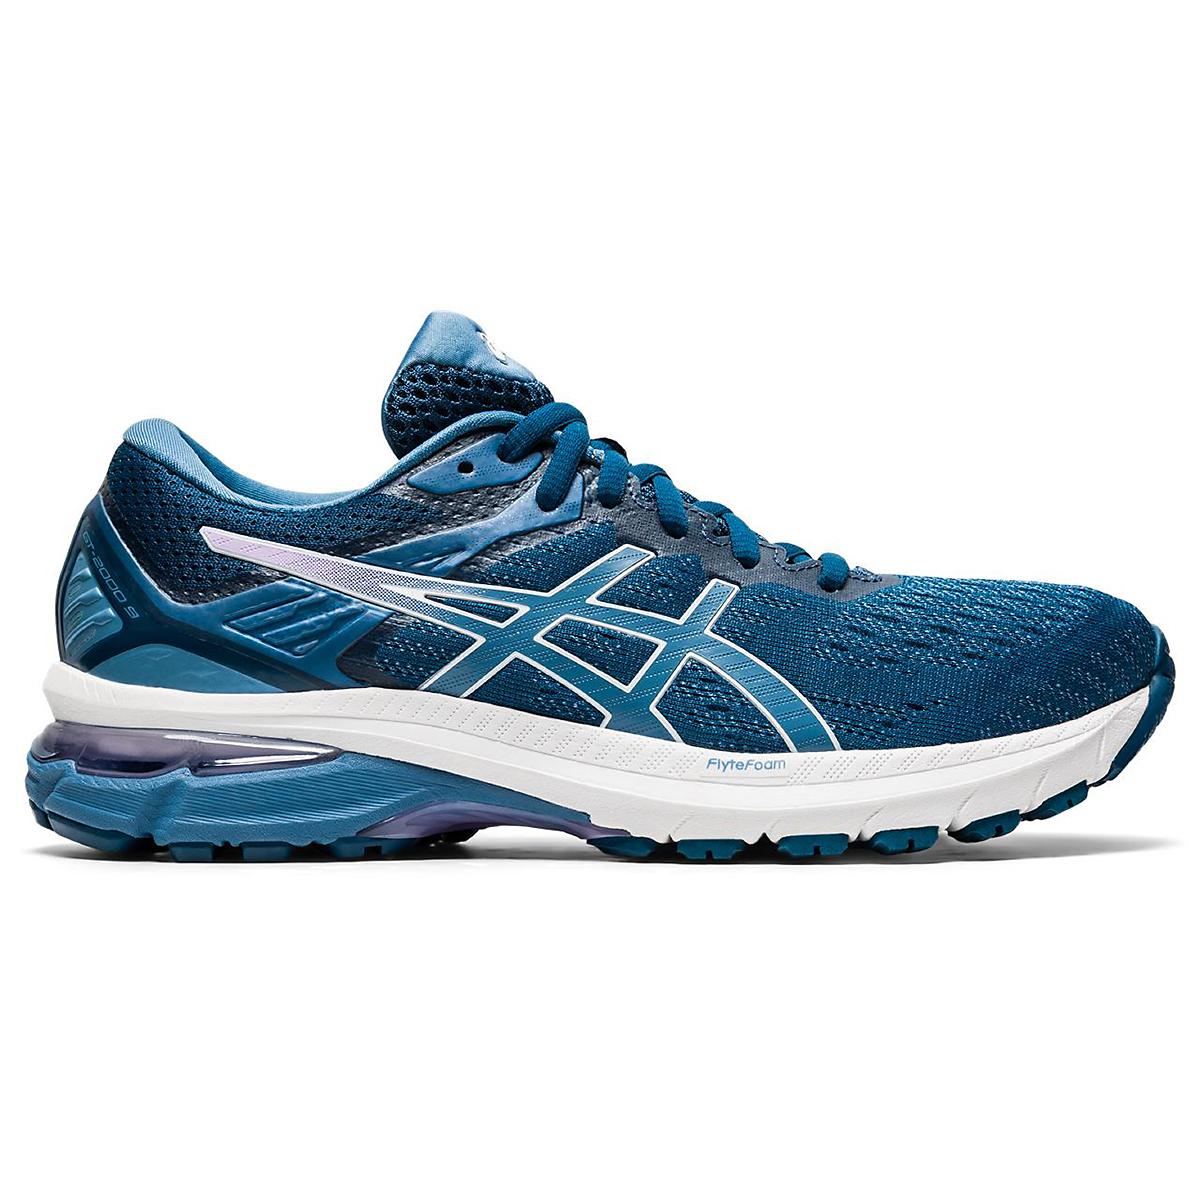 Women's Asics Gt-2000 9 Running Shoe - Color: Mako Blue/Grey Floss - Size: 5 - Width: Regular, Mako Blue/Grey Floss, large, image 1